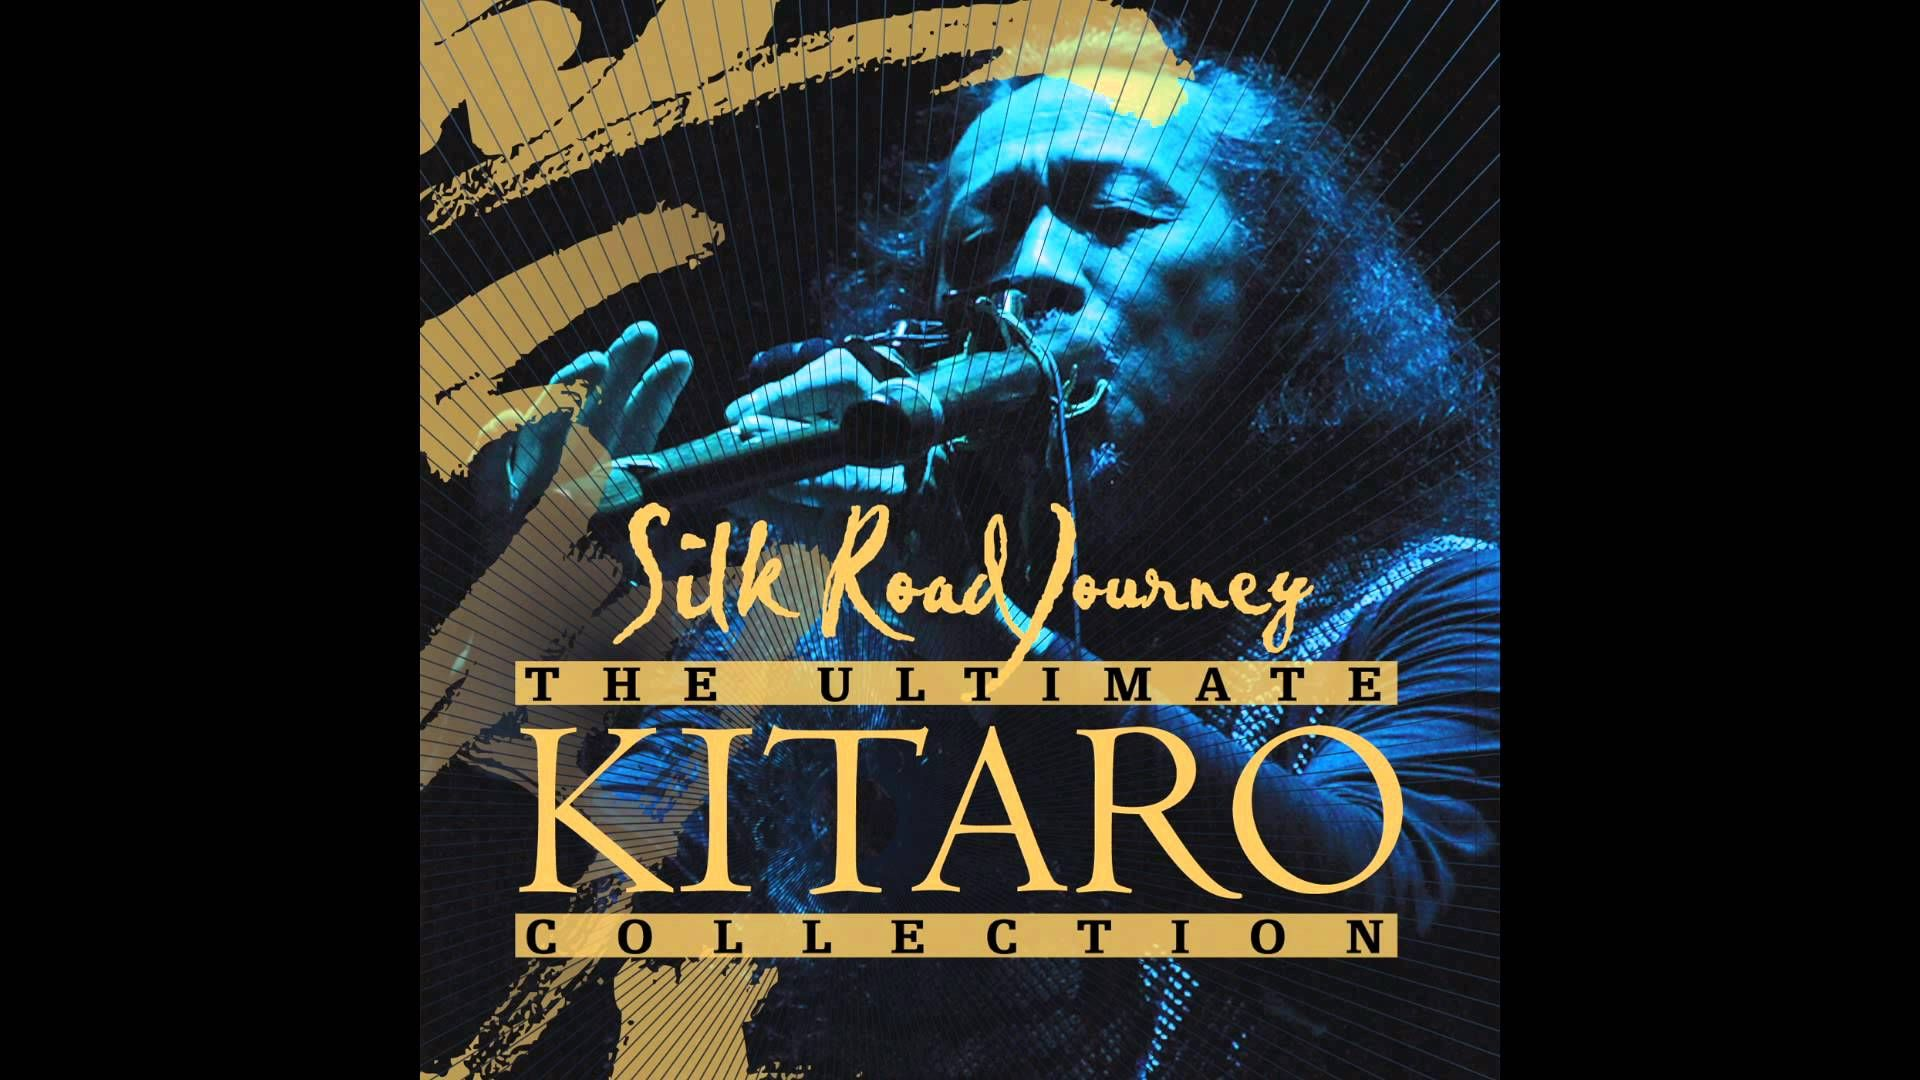 Kitaro - Heaven and Earth (DVD)